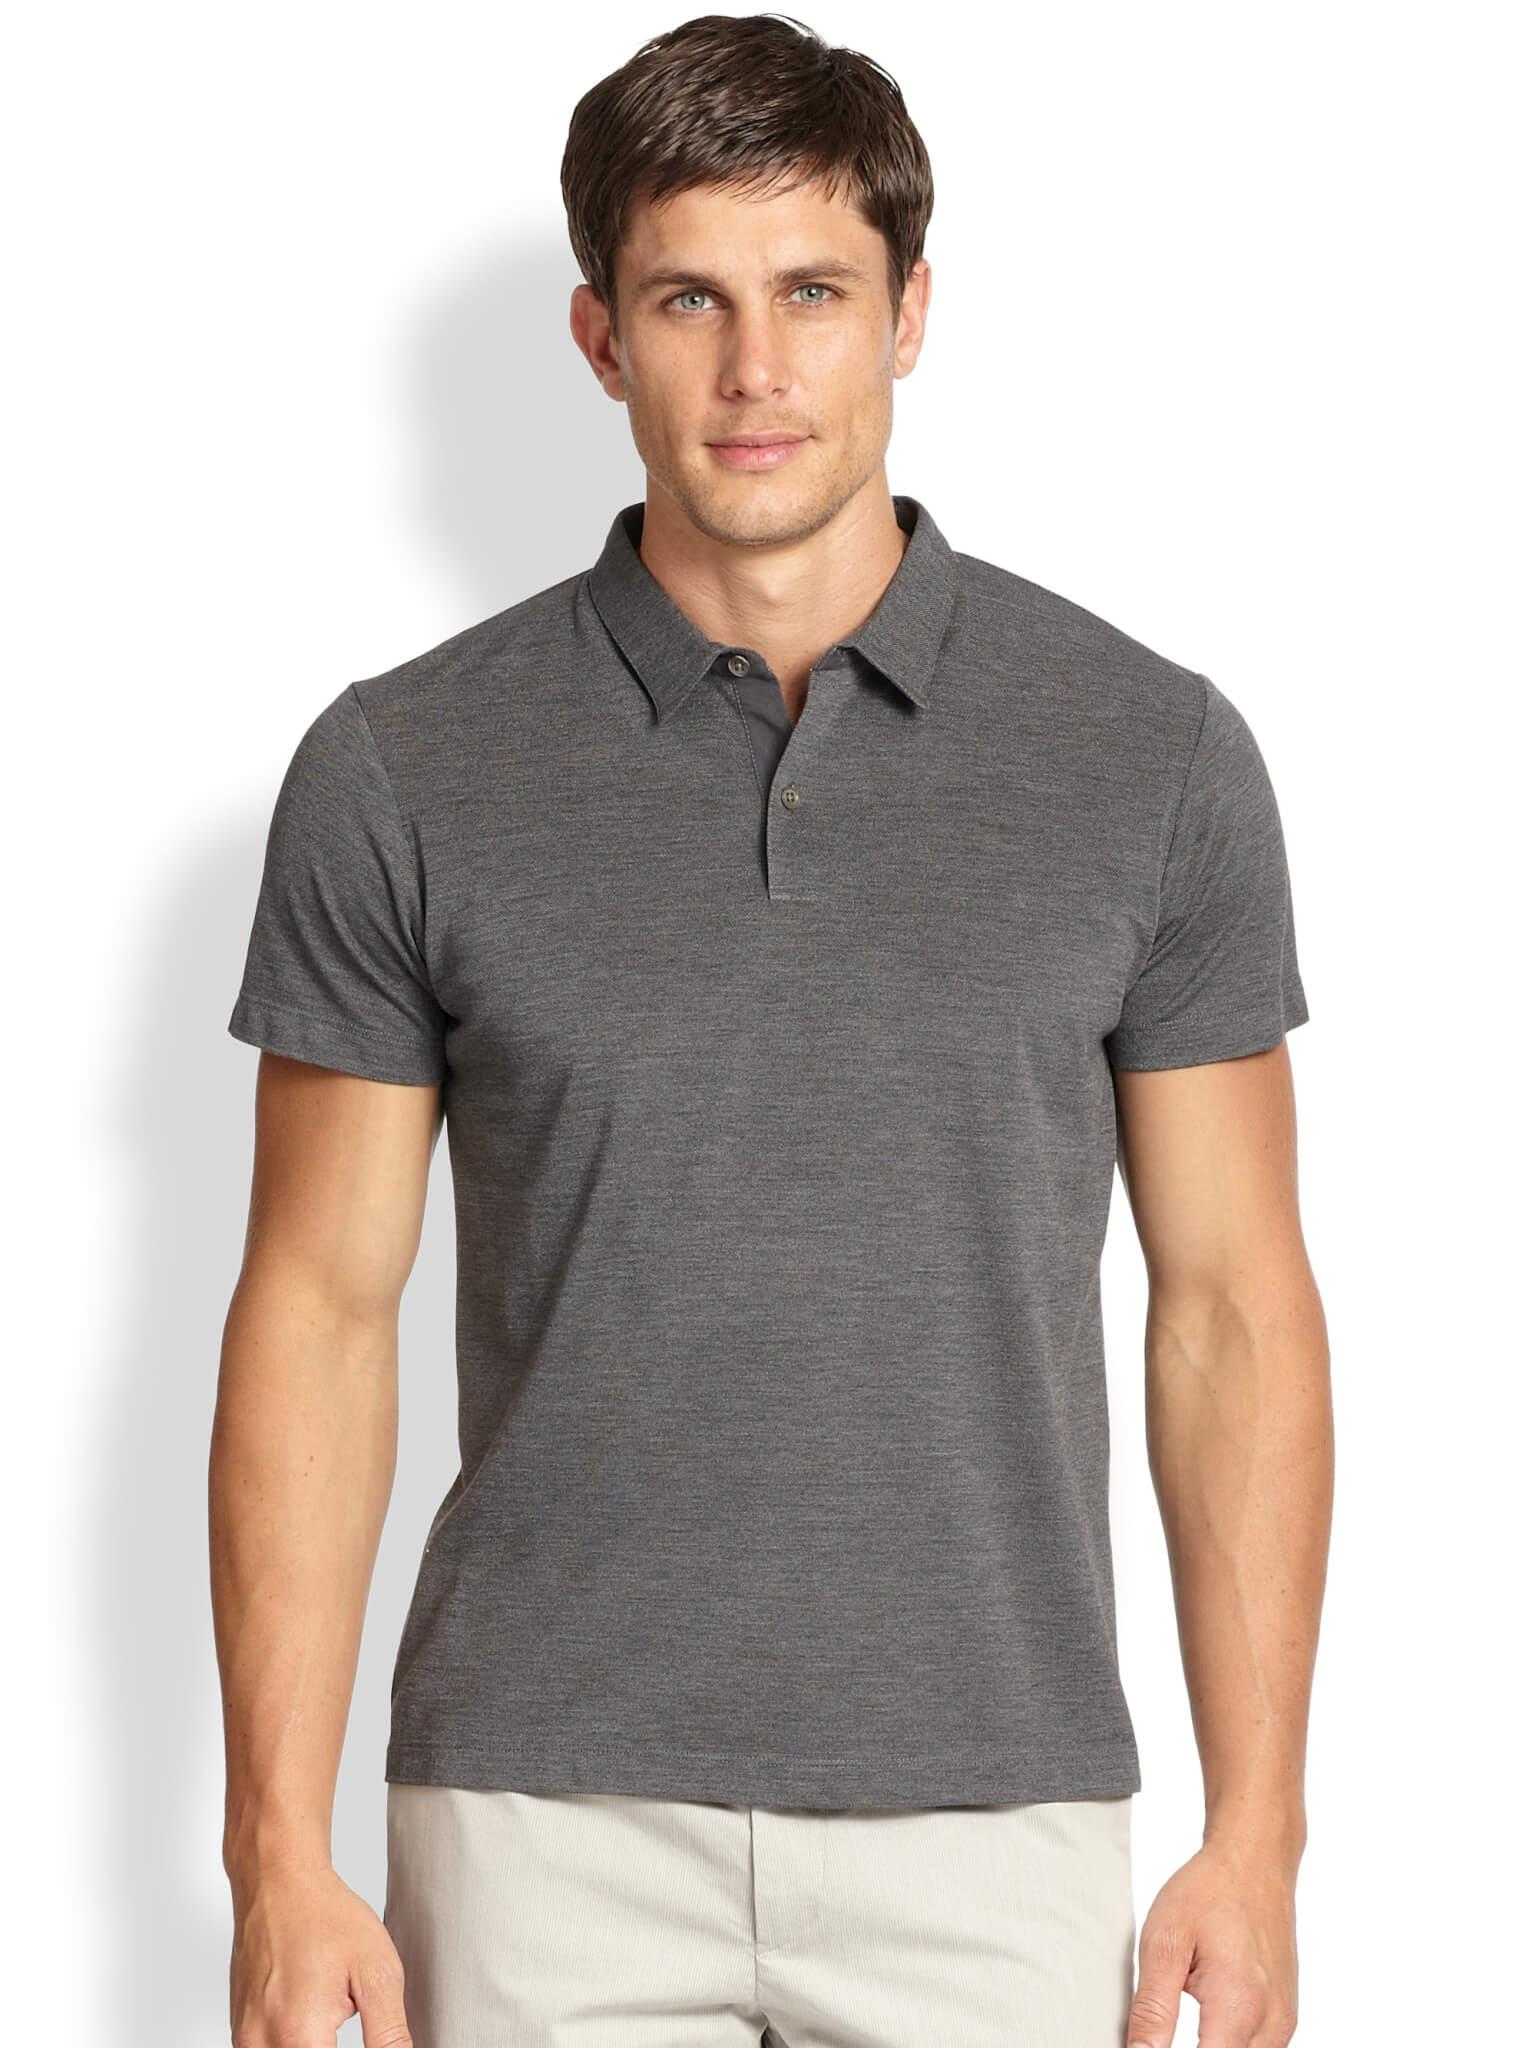 mens polo shirts silkblendpolo - ashley weston KDLUELZ